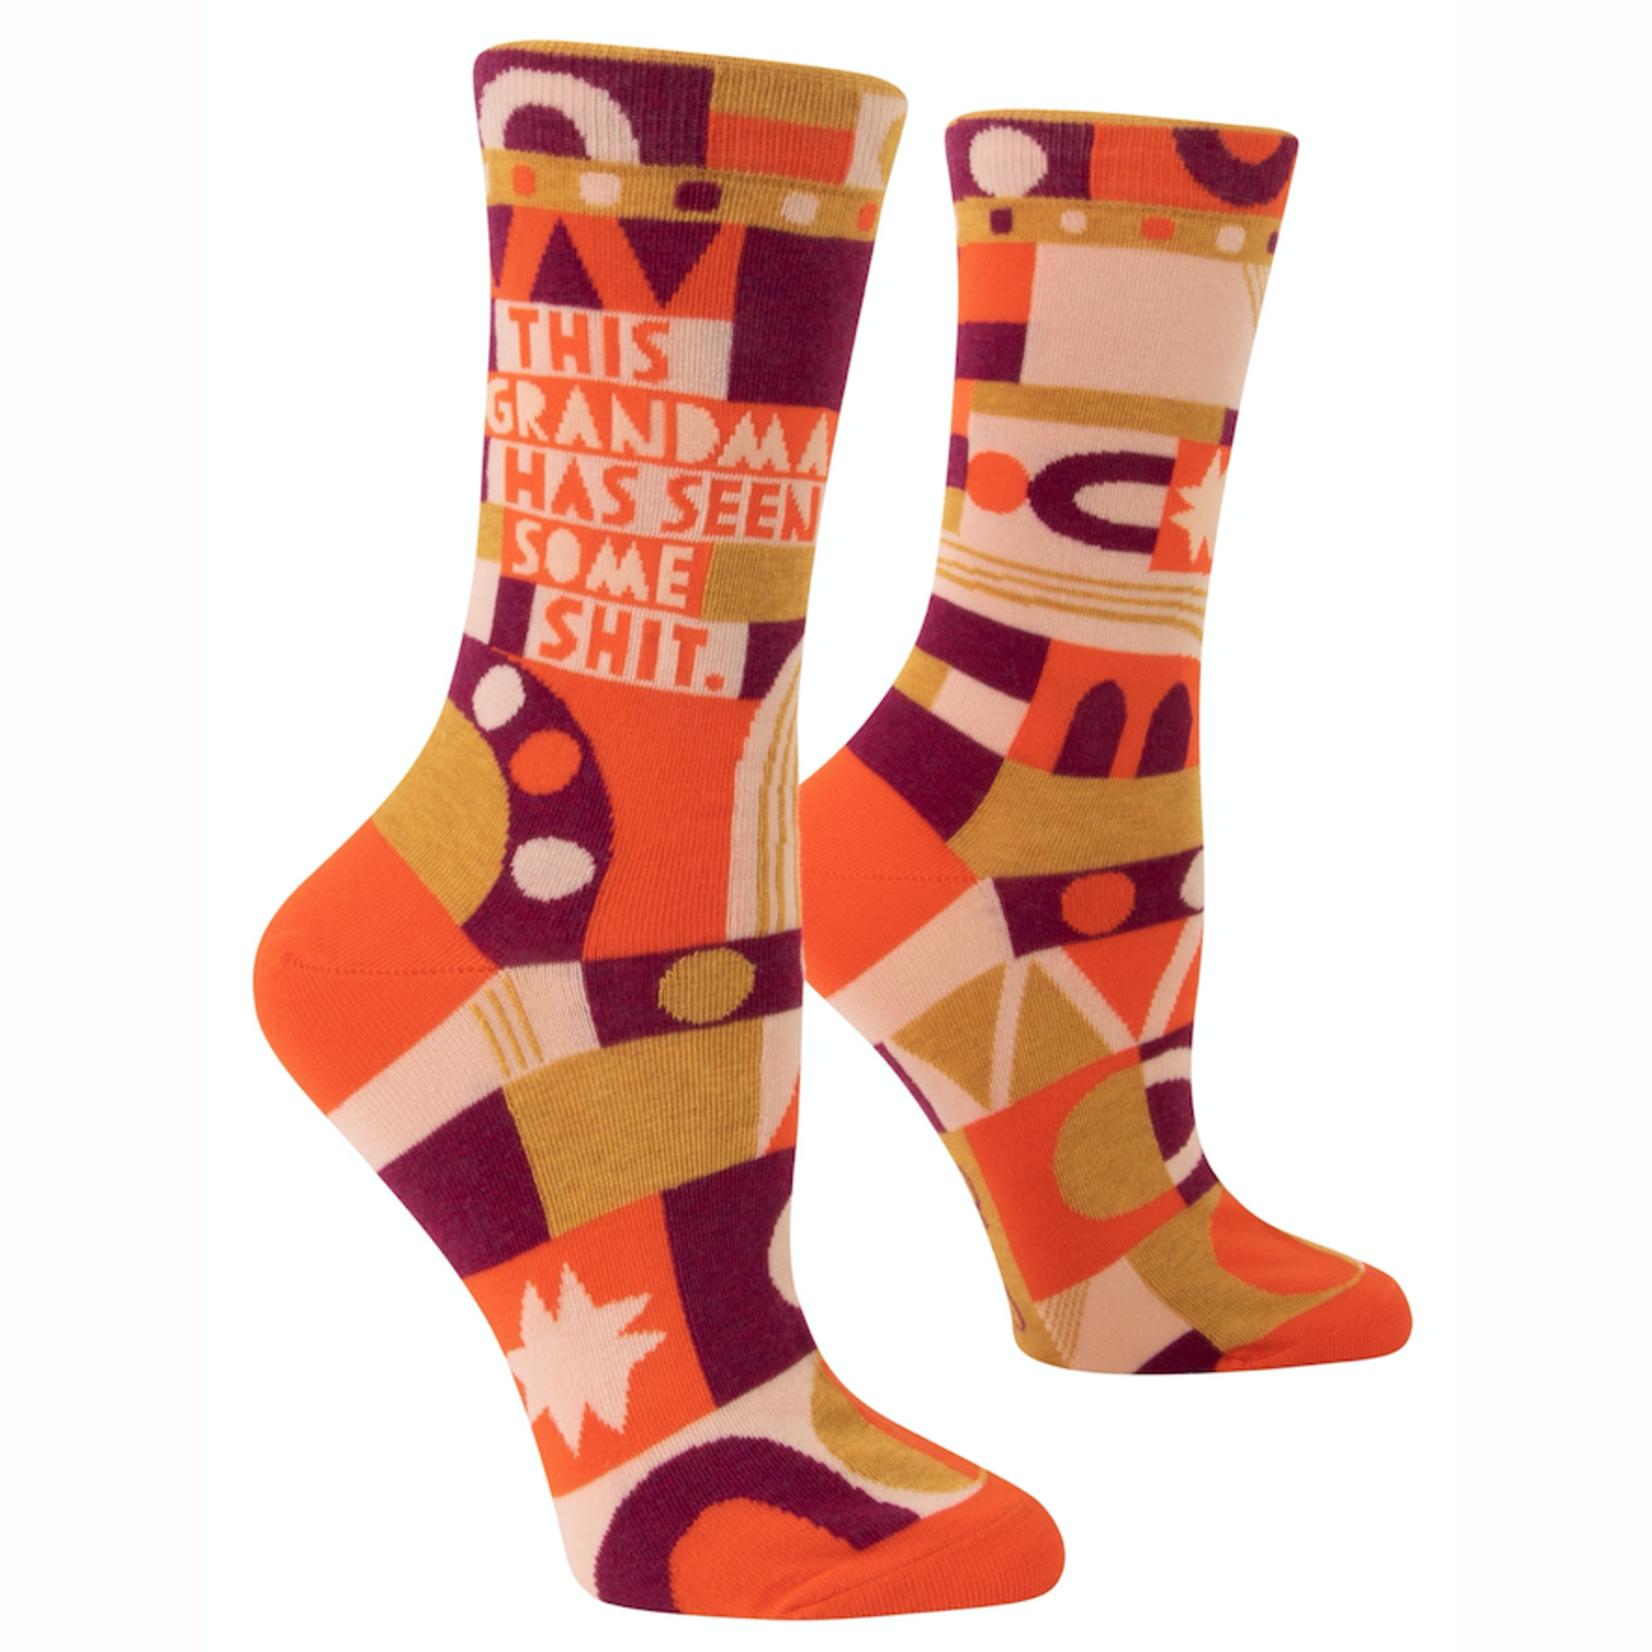 Grandma's Seen Shit Women's Crew Socks